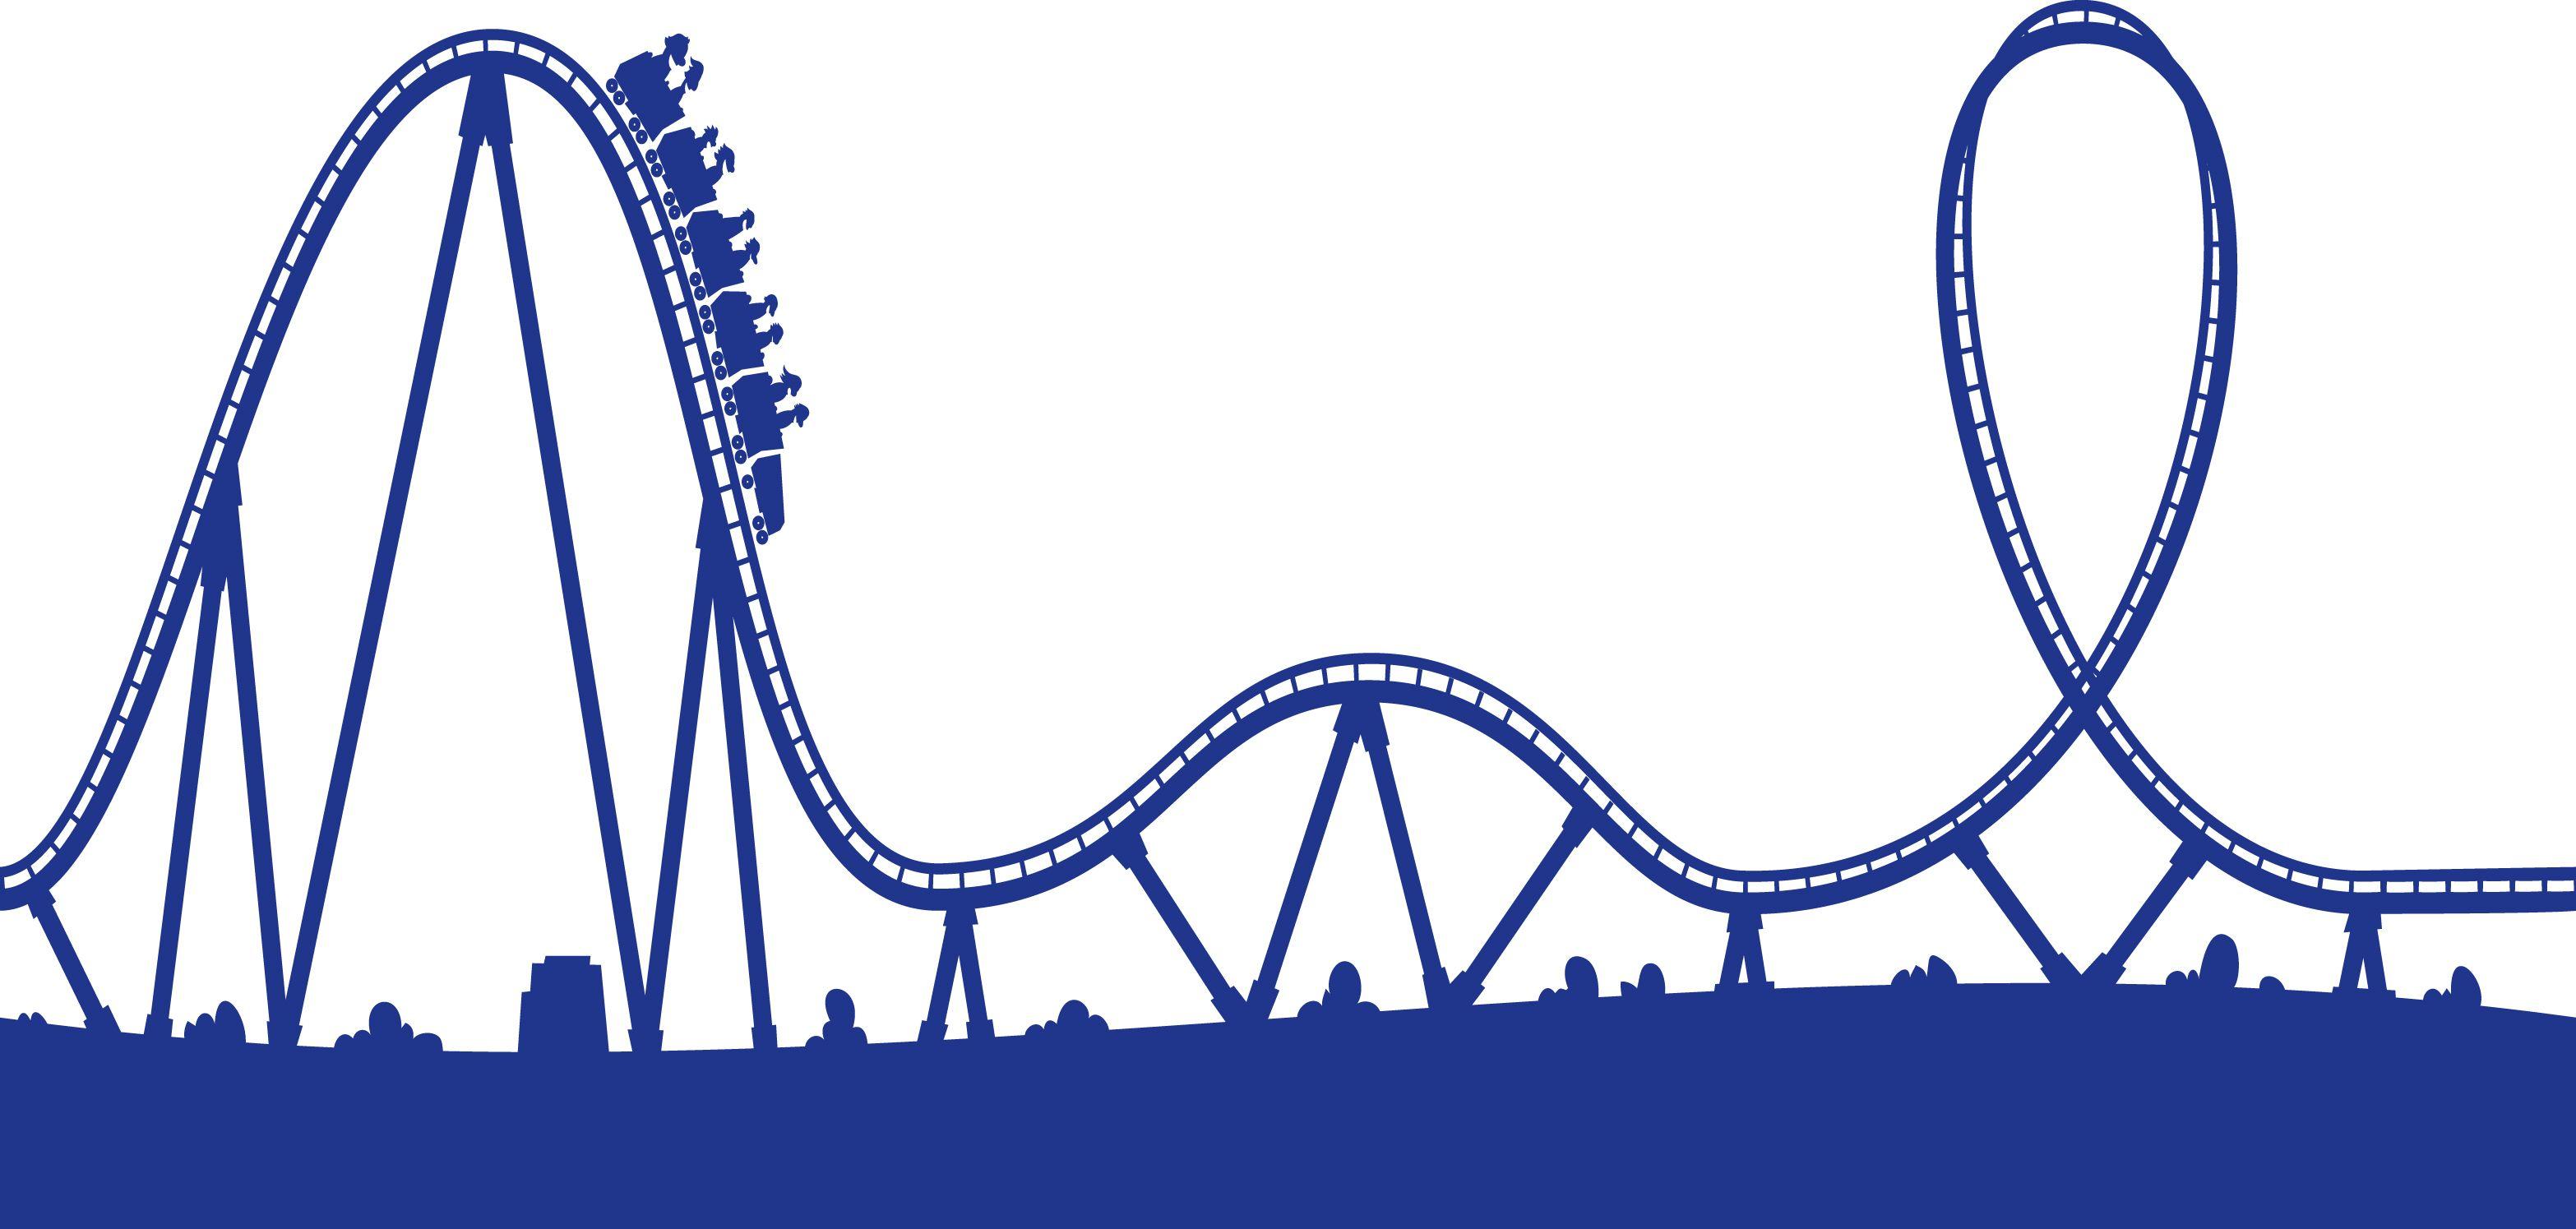 roller coaster track clipart bullets pinterest roller coaster rh pinterest com roller coaster clipart images free roller coaster clipart gifs